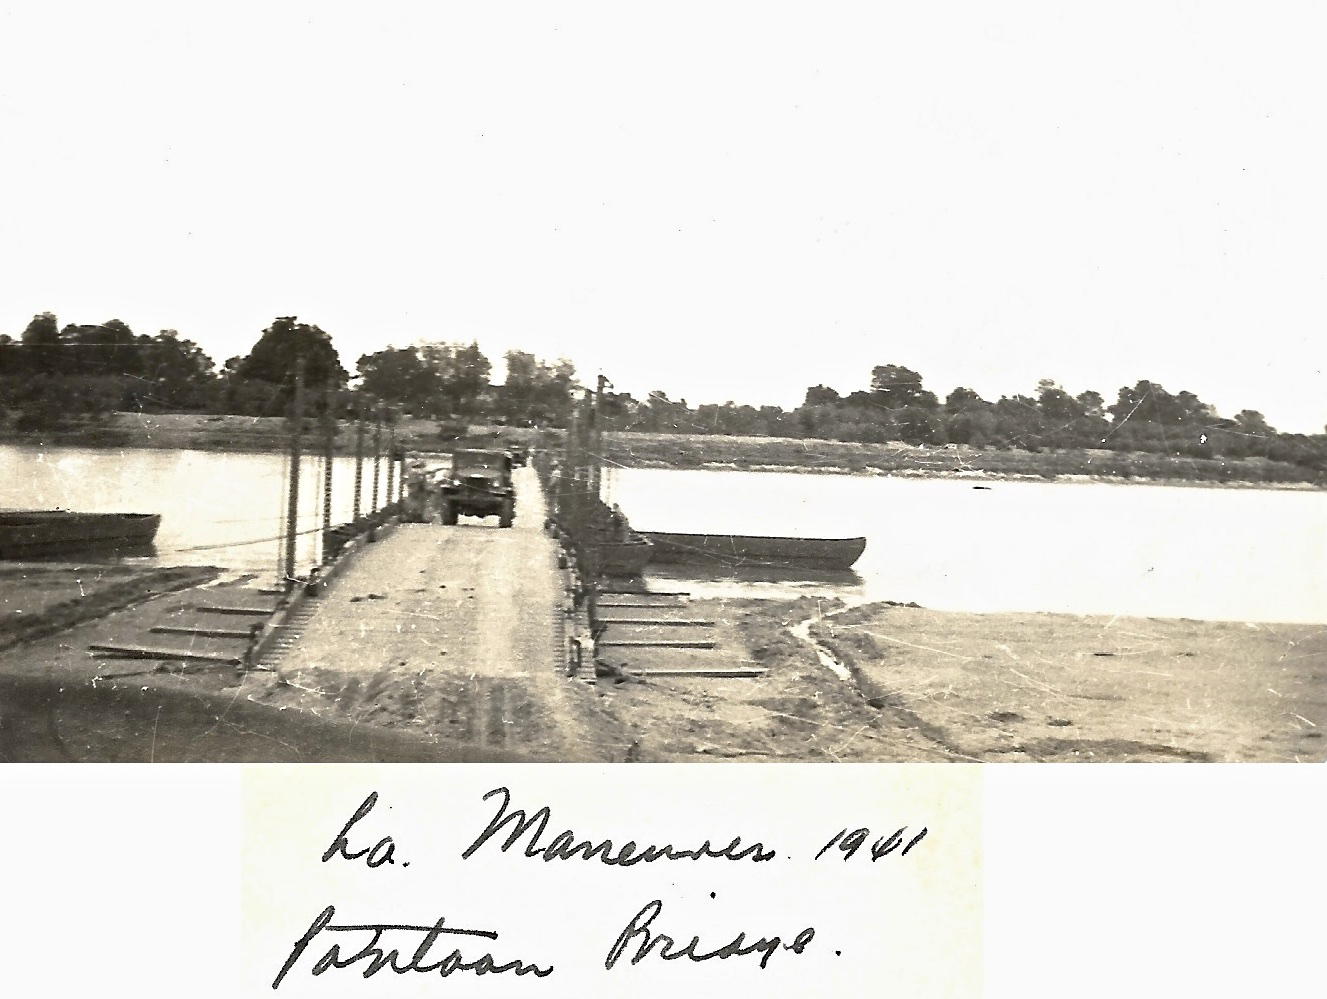 1941 Louisiana Maneuvers Pontoon Bridge